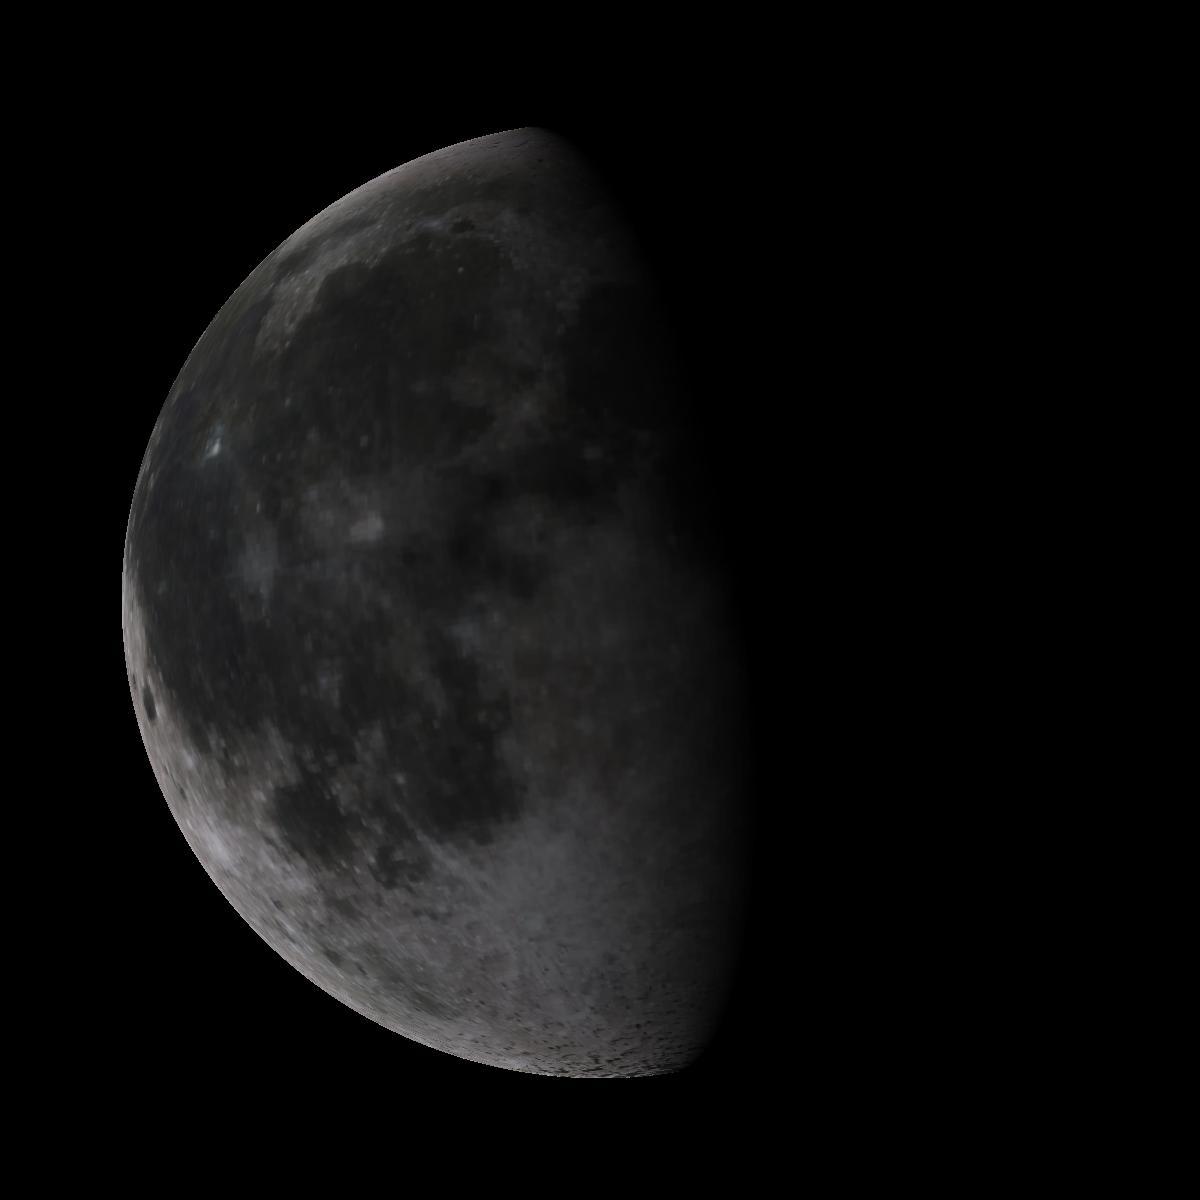 Lune du 15 mars 2020